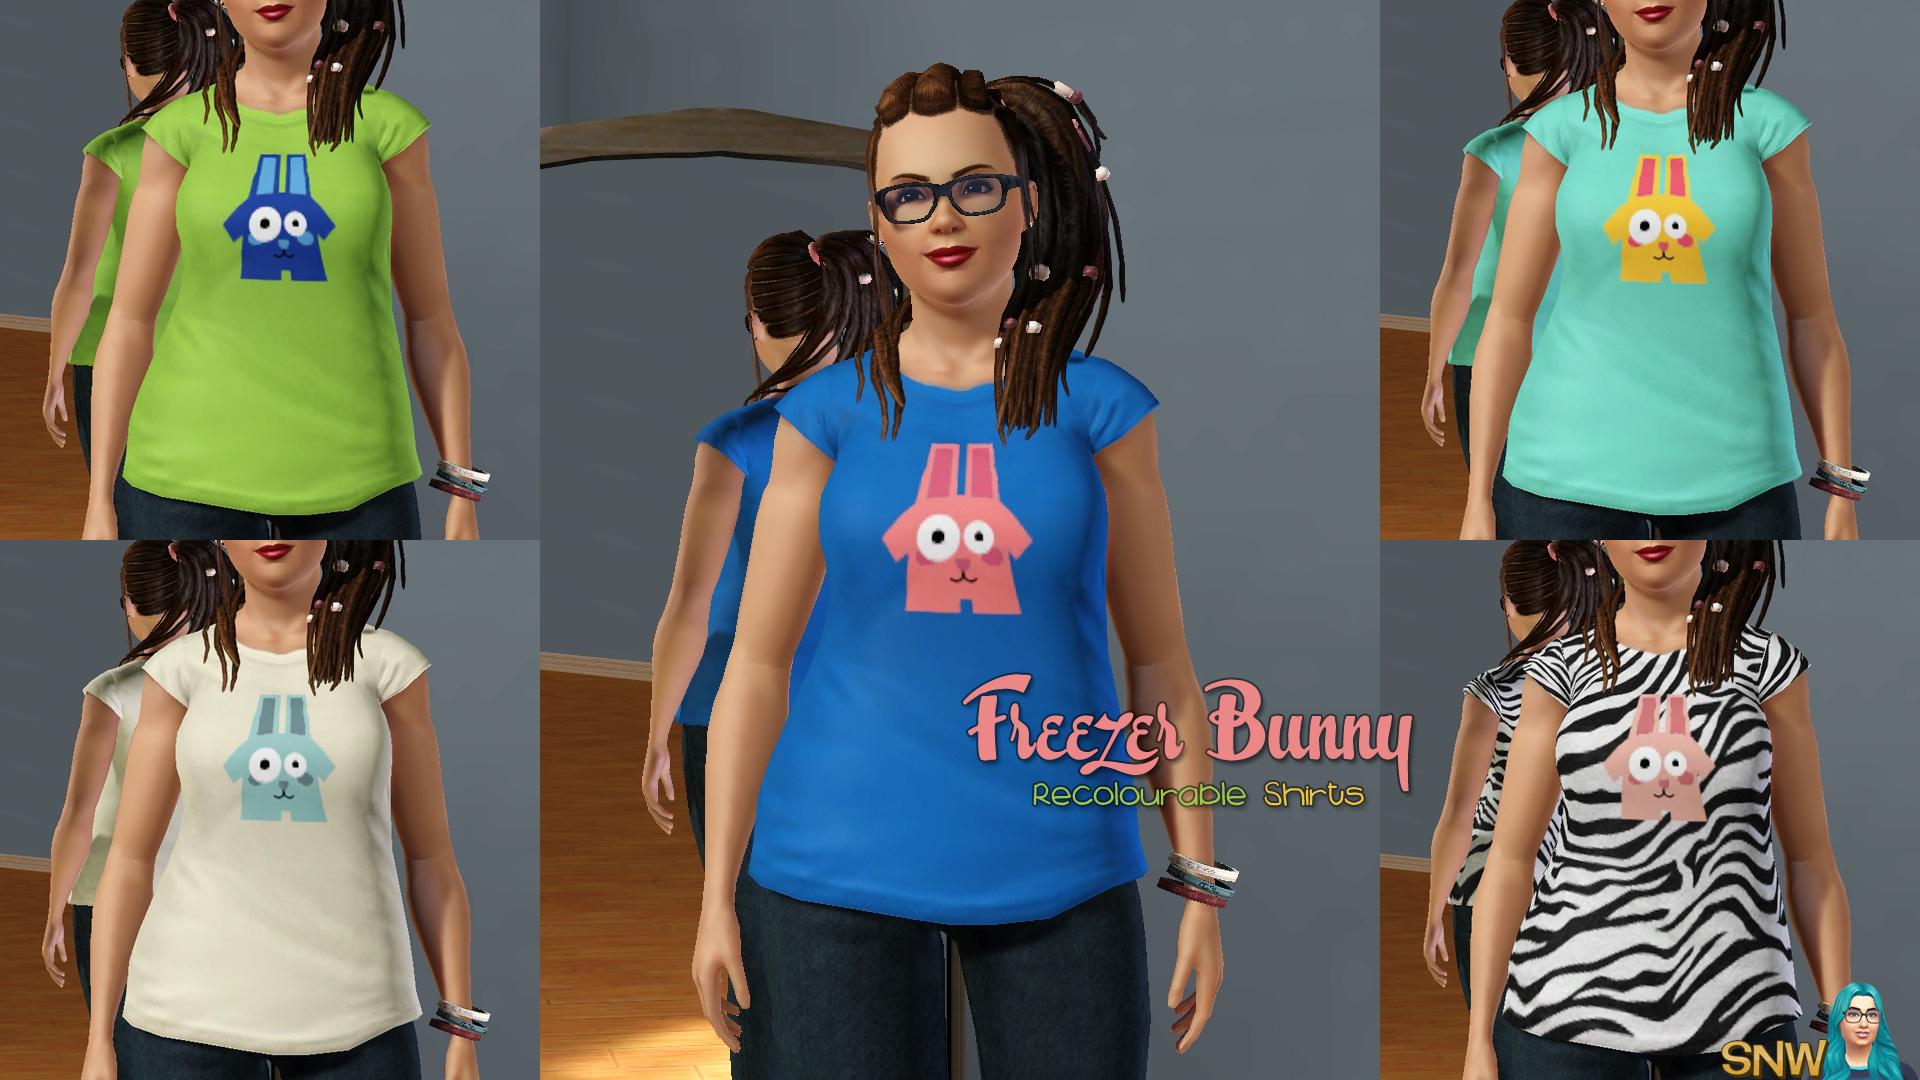 Recolourable Freezer Bunny Shirts